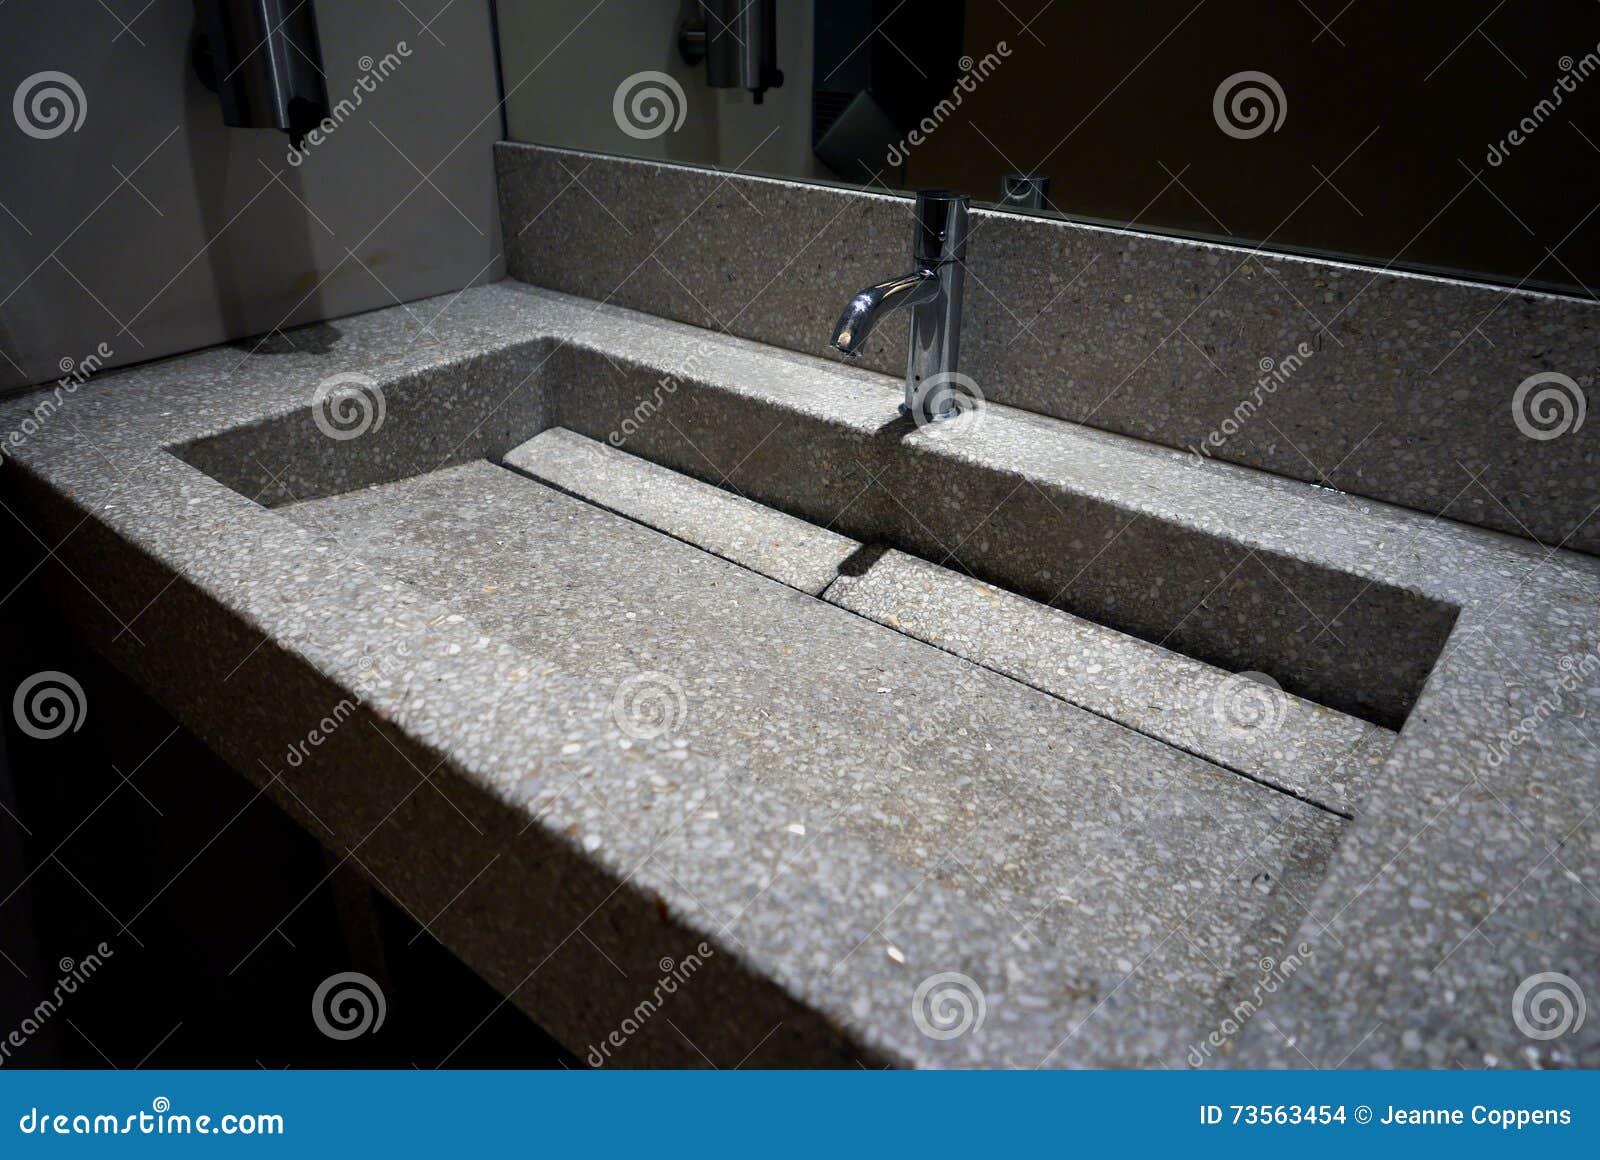 Hand Wash Basin Granit Worktop Stock Photo Image 73563454